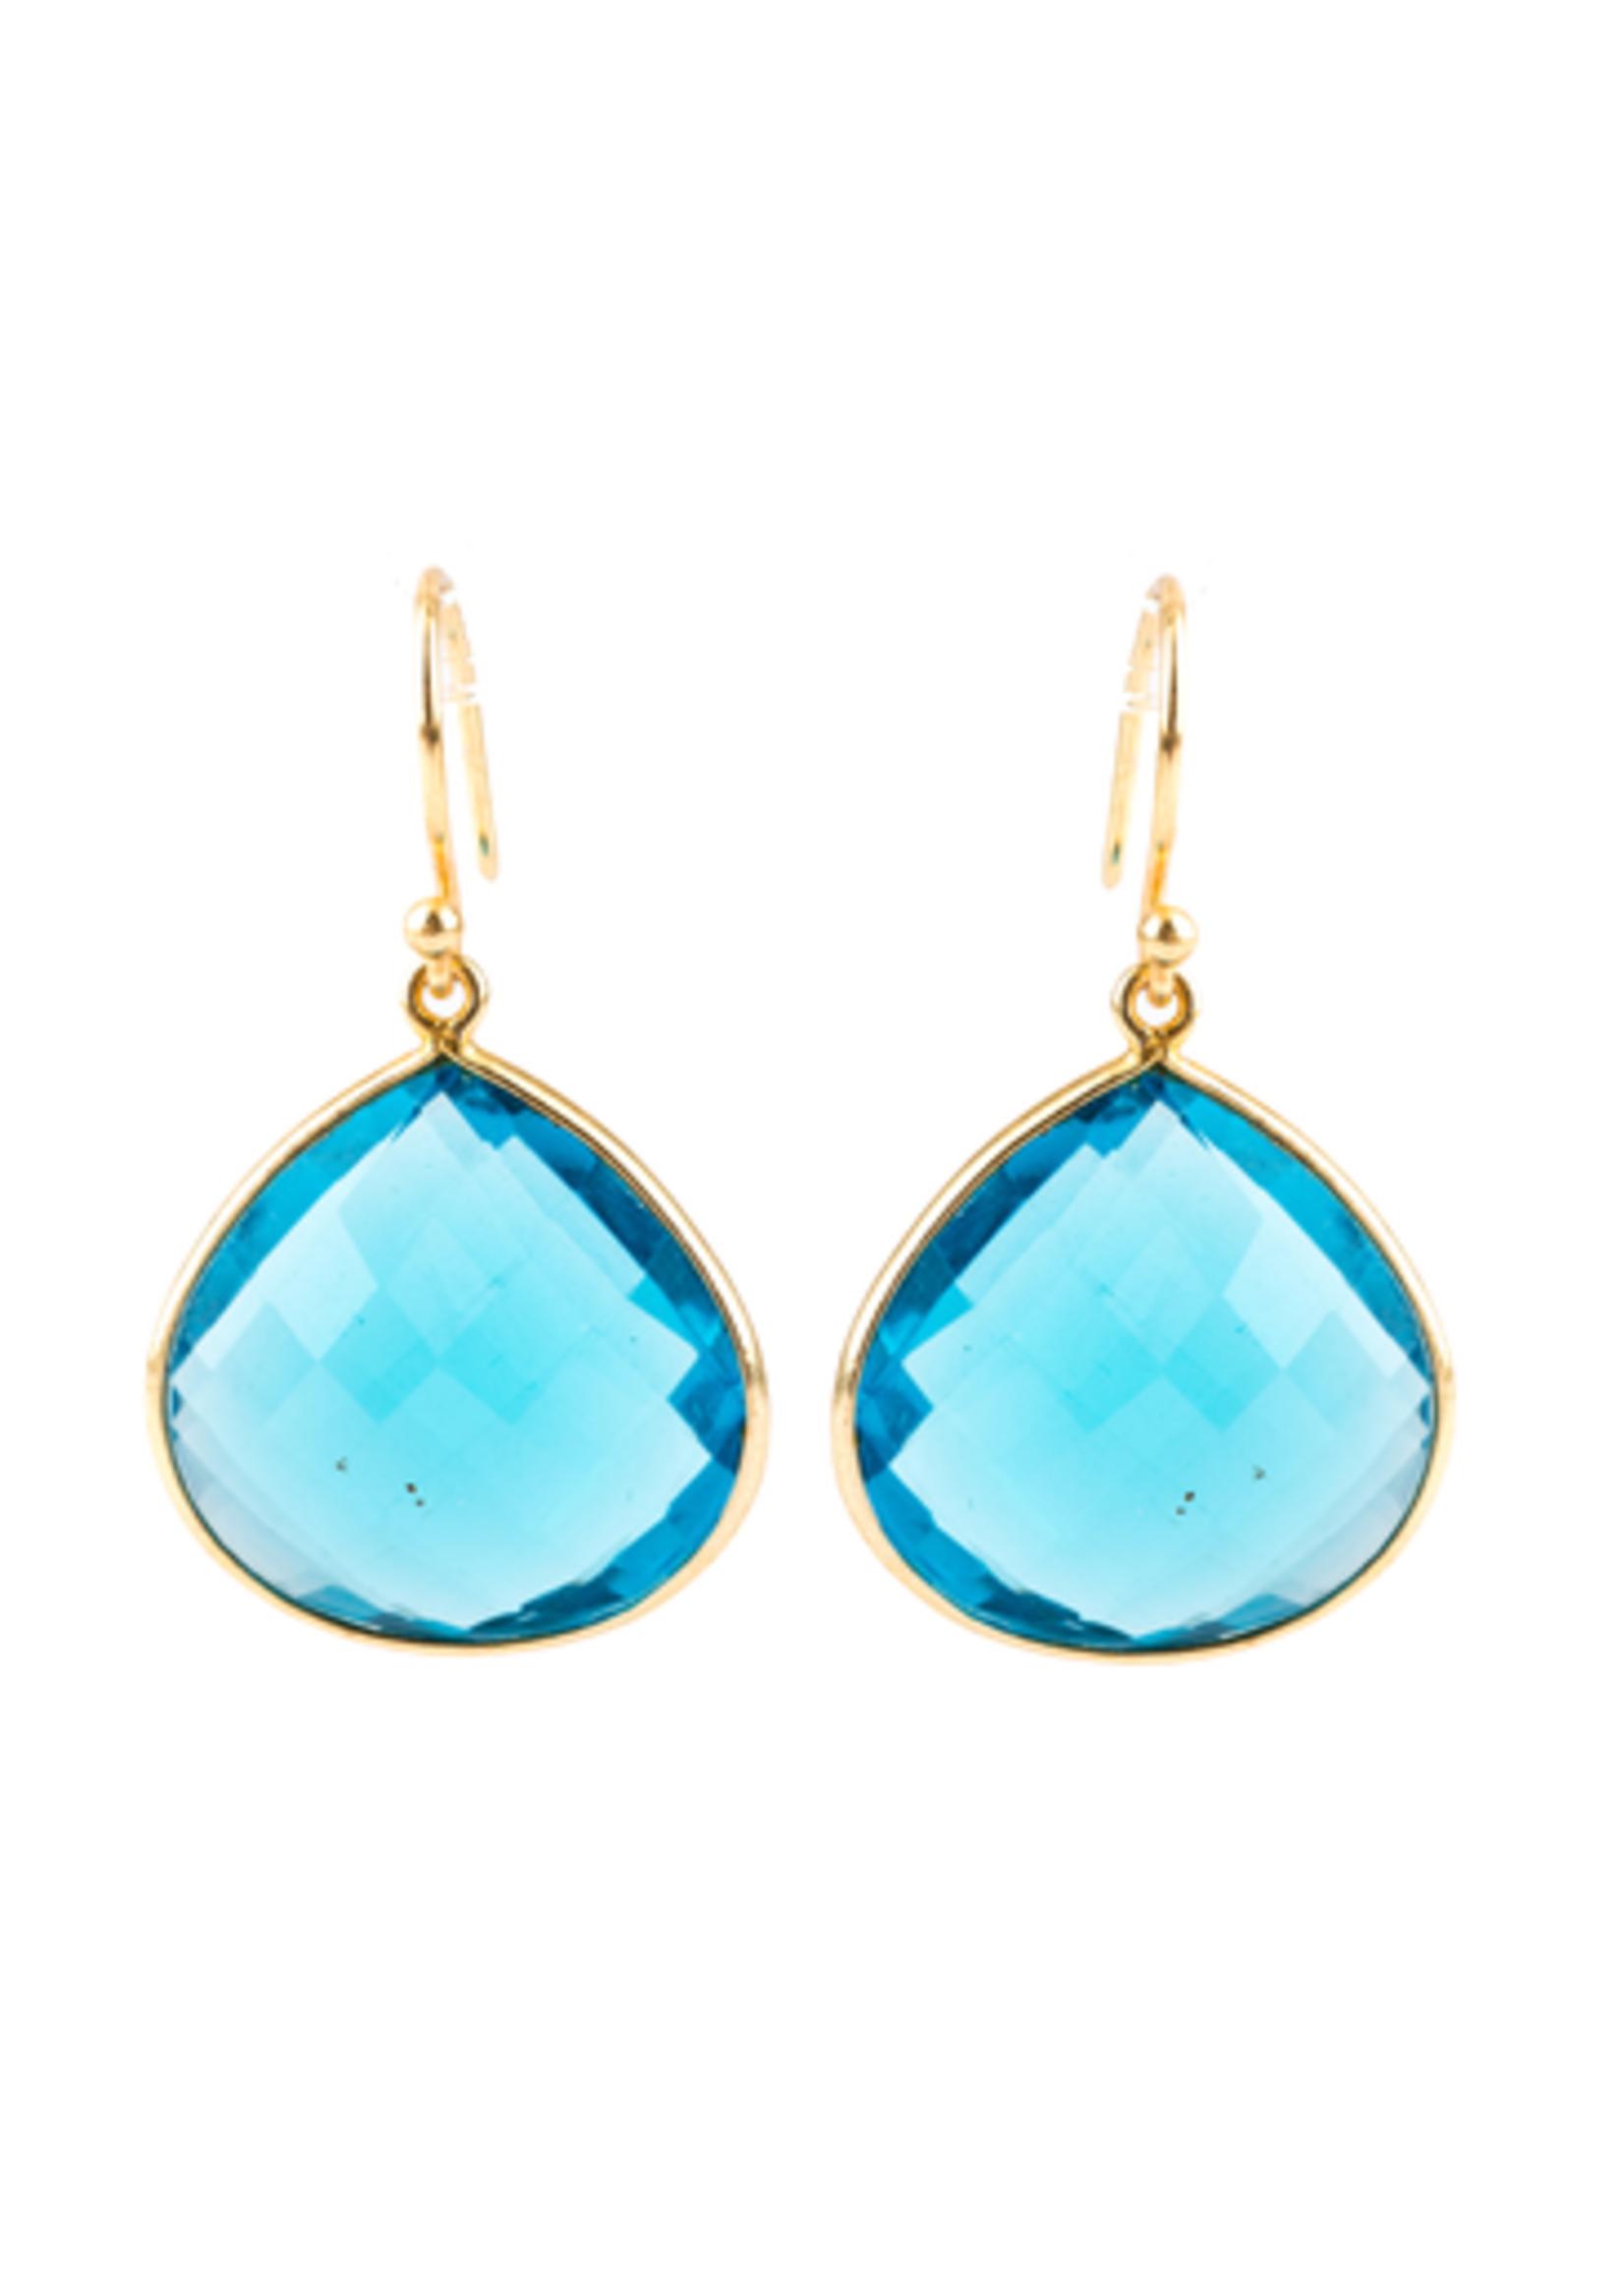 Mina Danielle Blue Quartz Pear shaped earrings